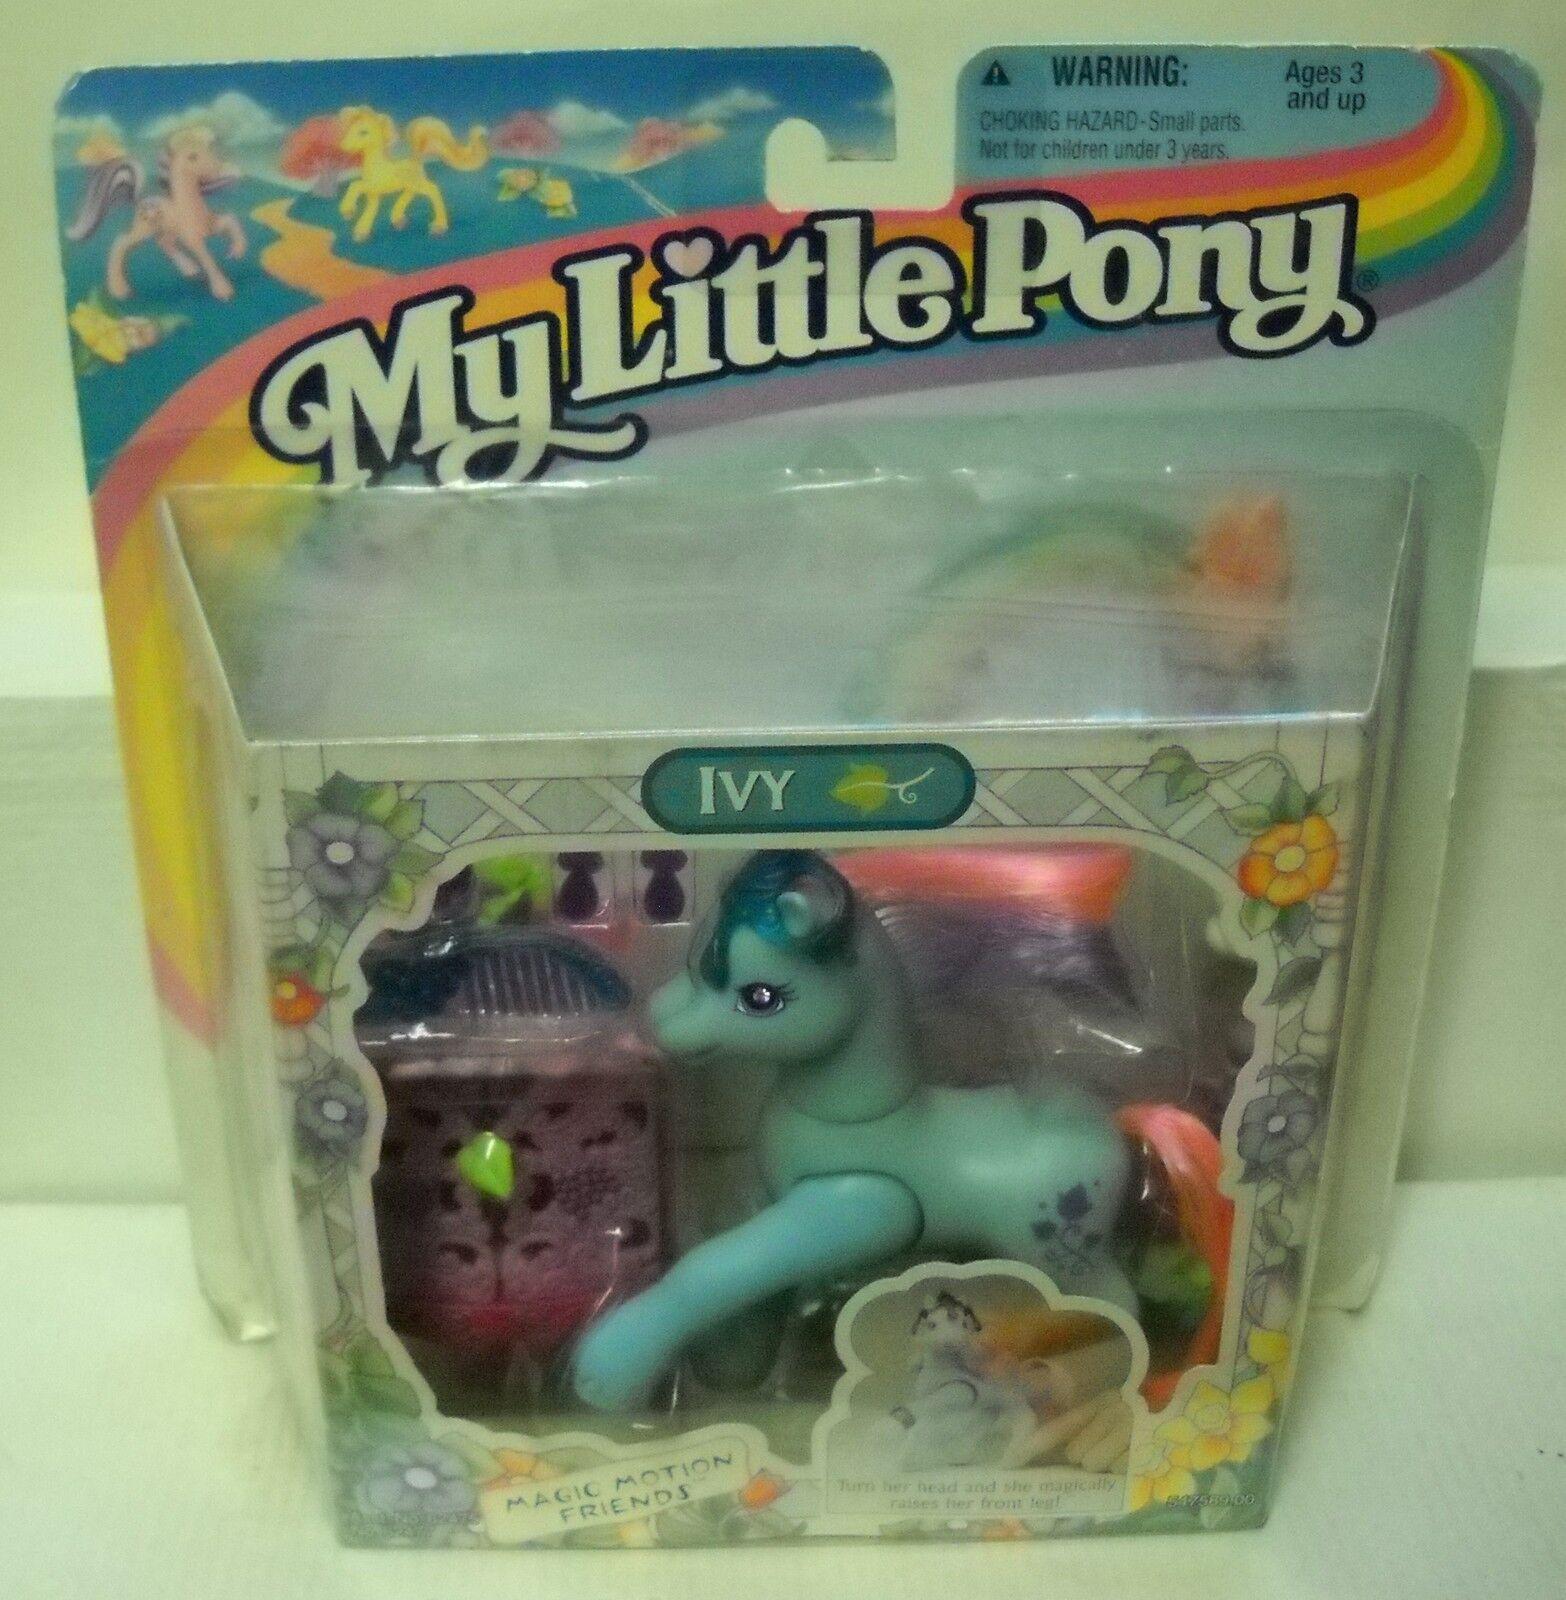 NRFC Vintage Kenner (Hasbro) My Little Pony Magic Motion Friends Ivy